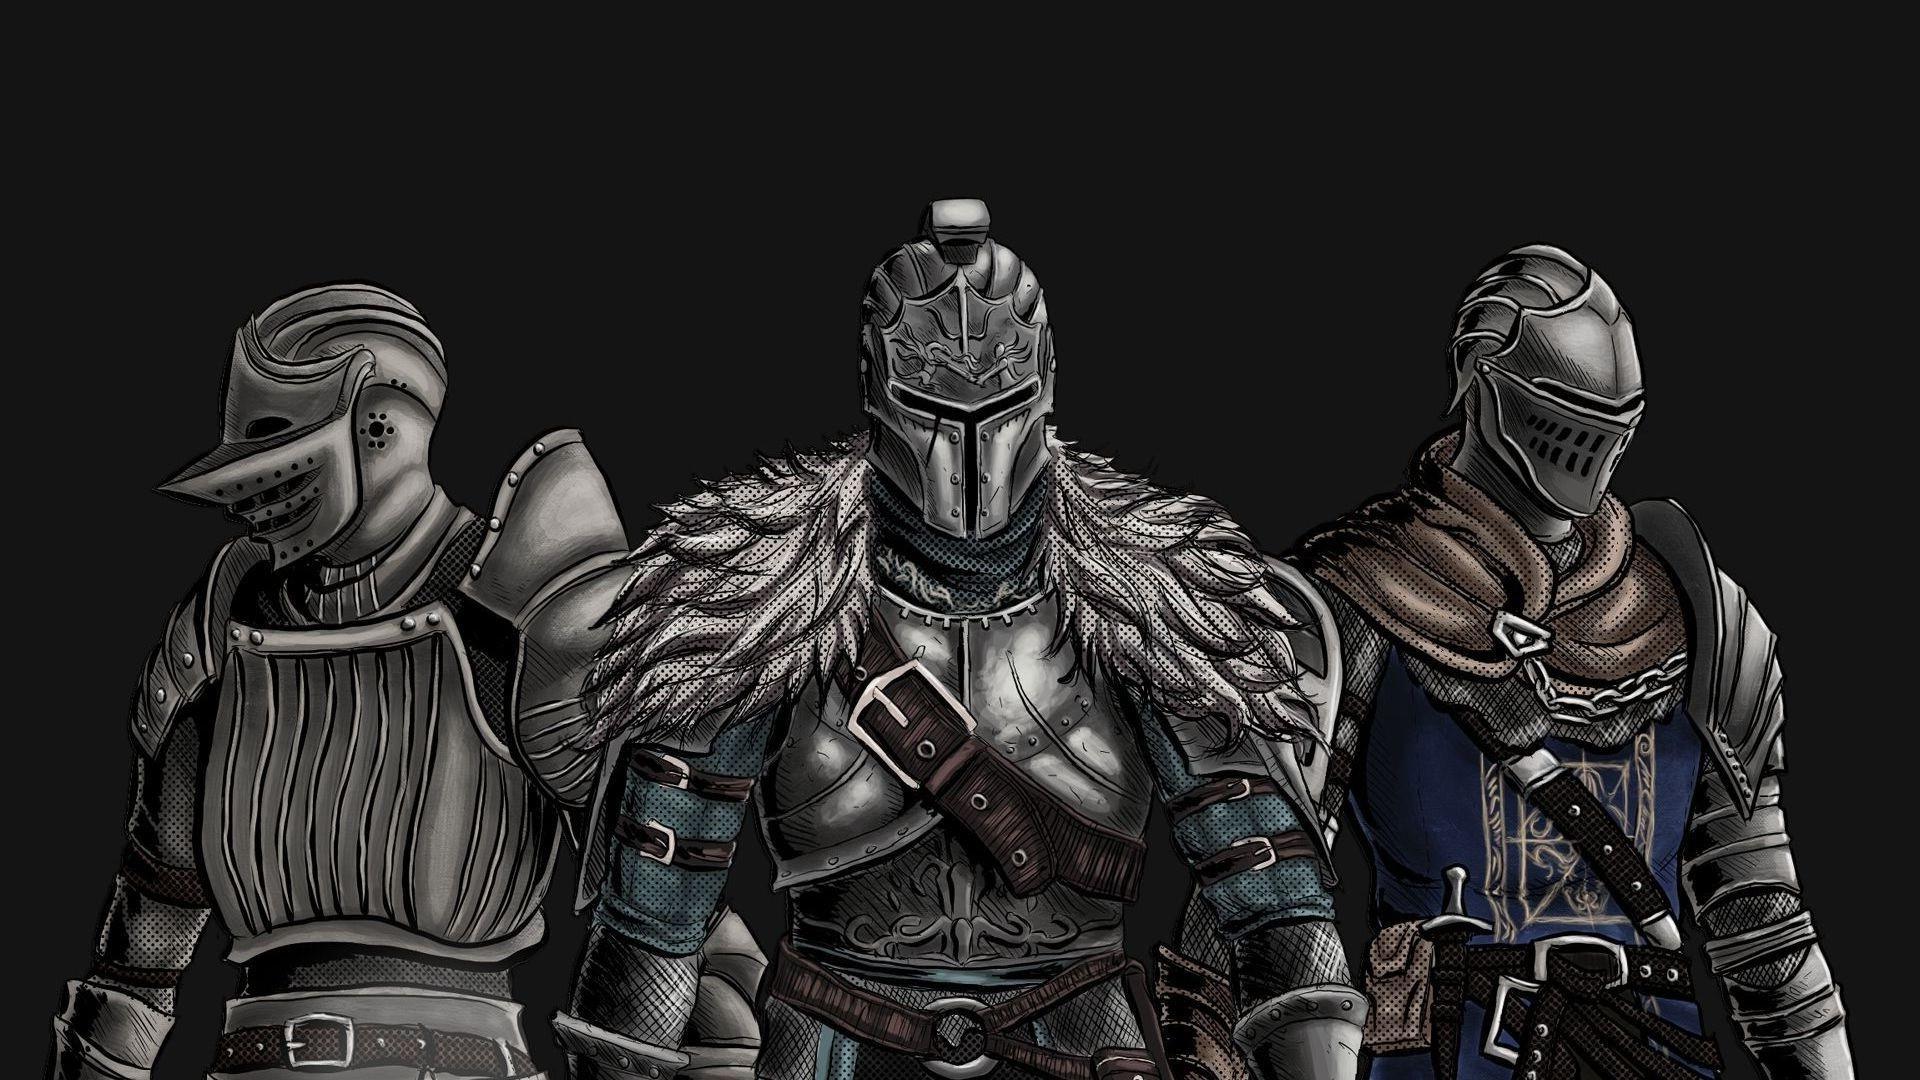 Fondos De Pantalla Videojuegos Dark Souls Ii Almas